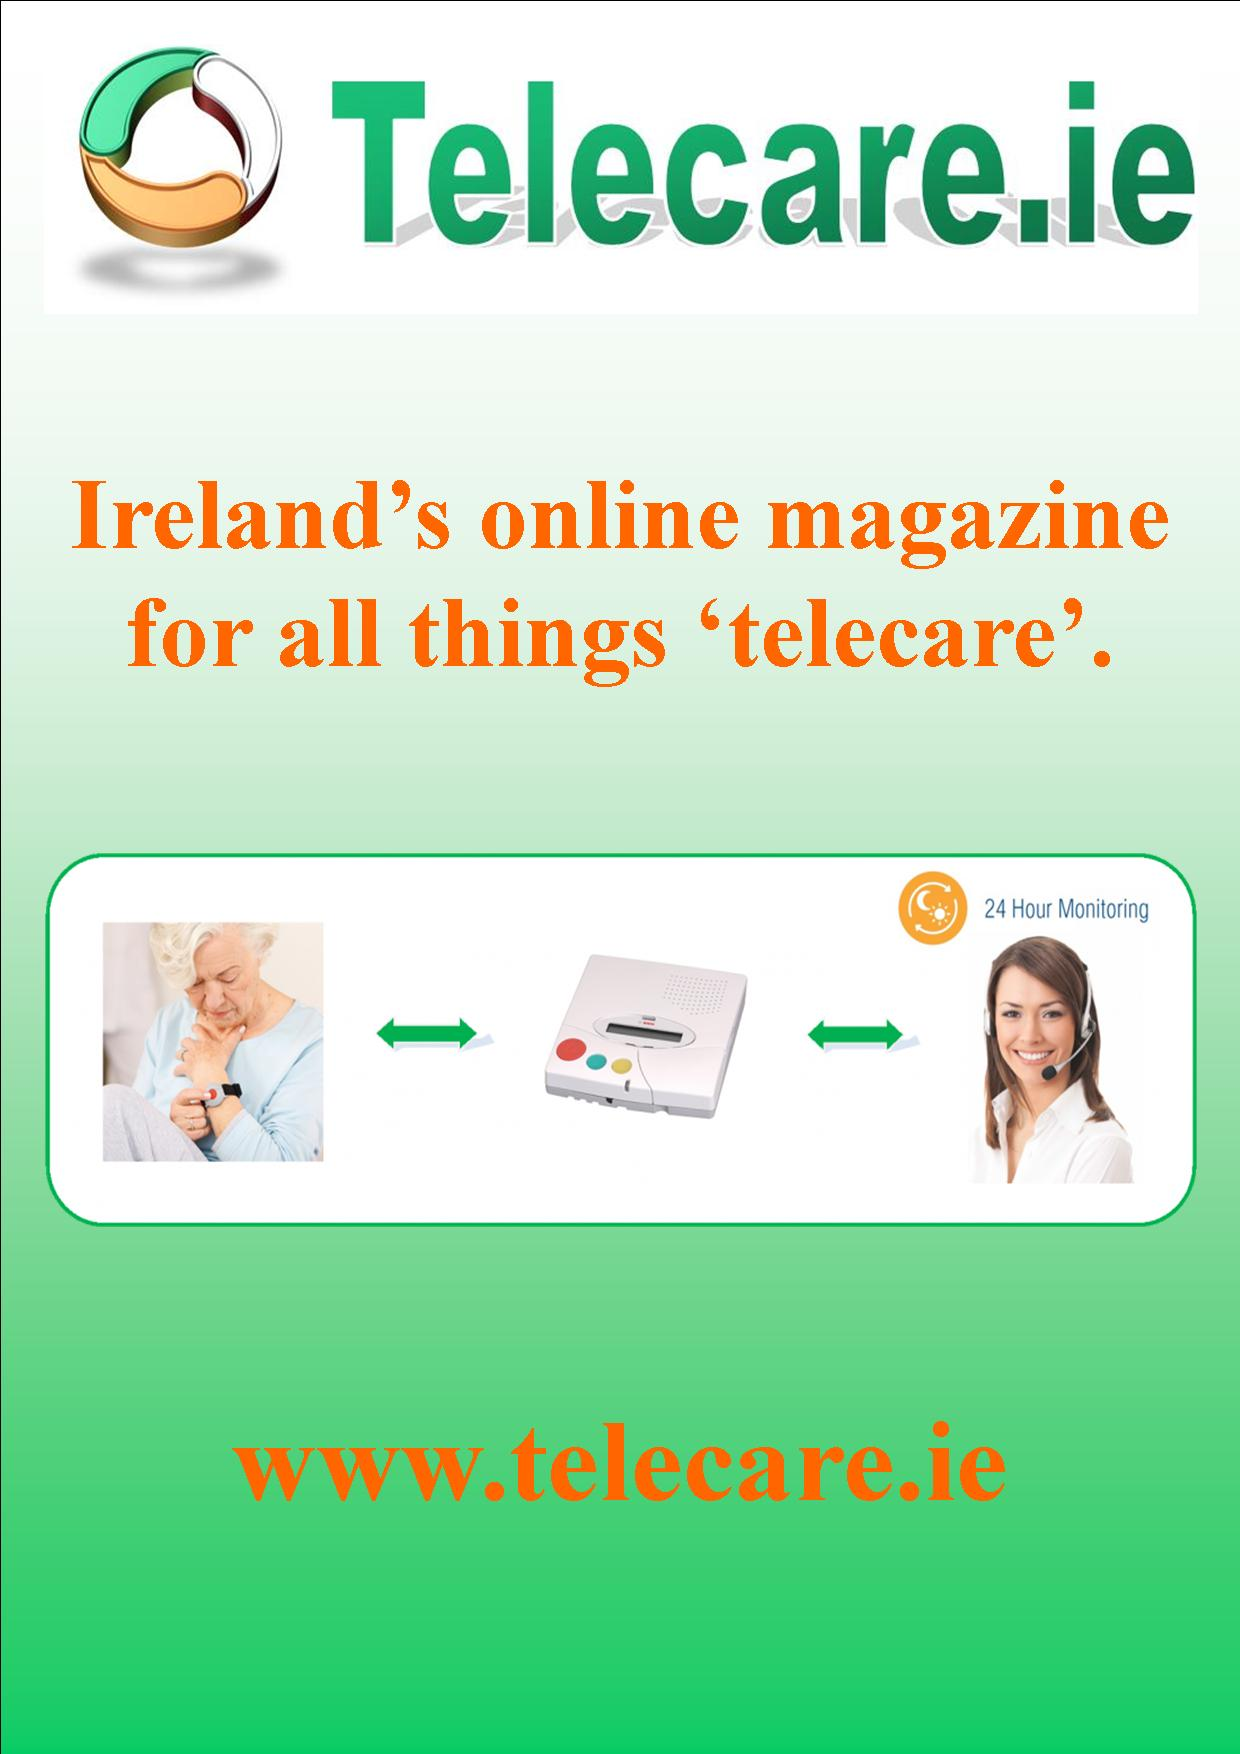 telecare.ie Advert